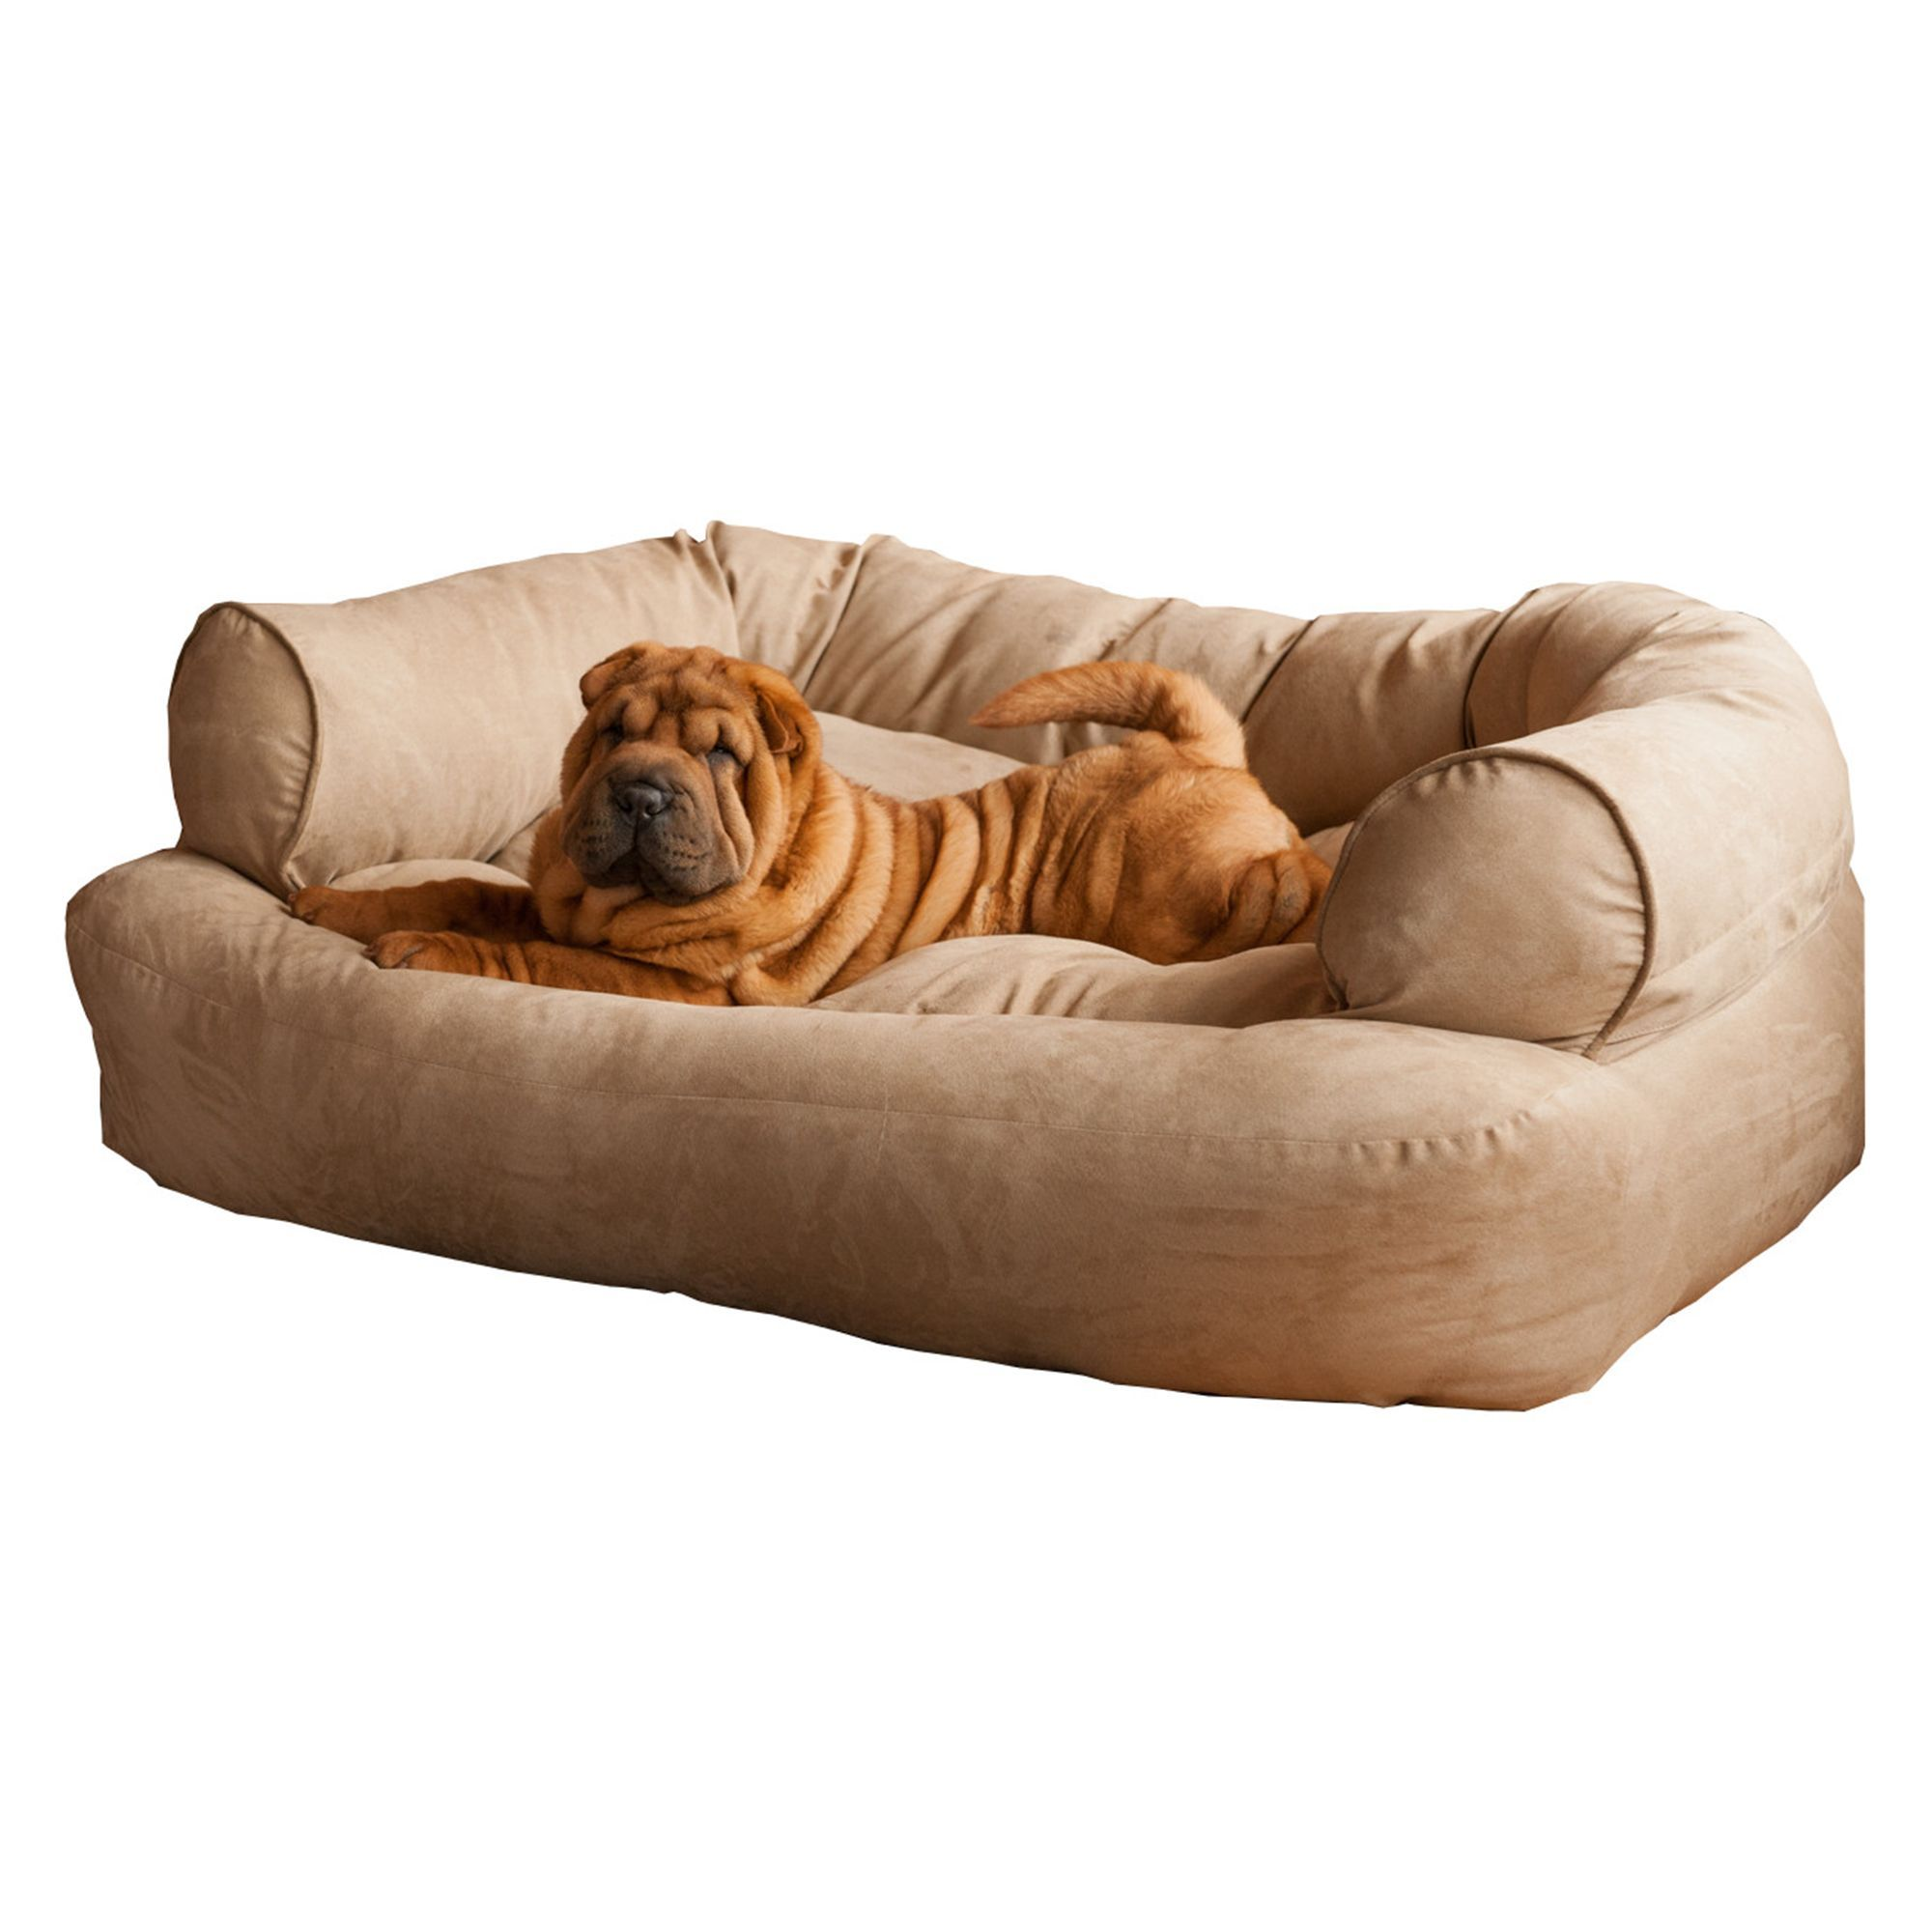 Best Snoozer Overstuffed Luxury Sofa Pet Bed Size 54 L X 36 W 640 x 480